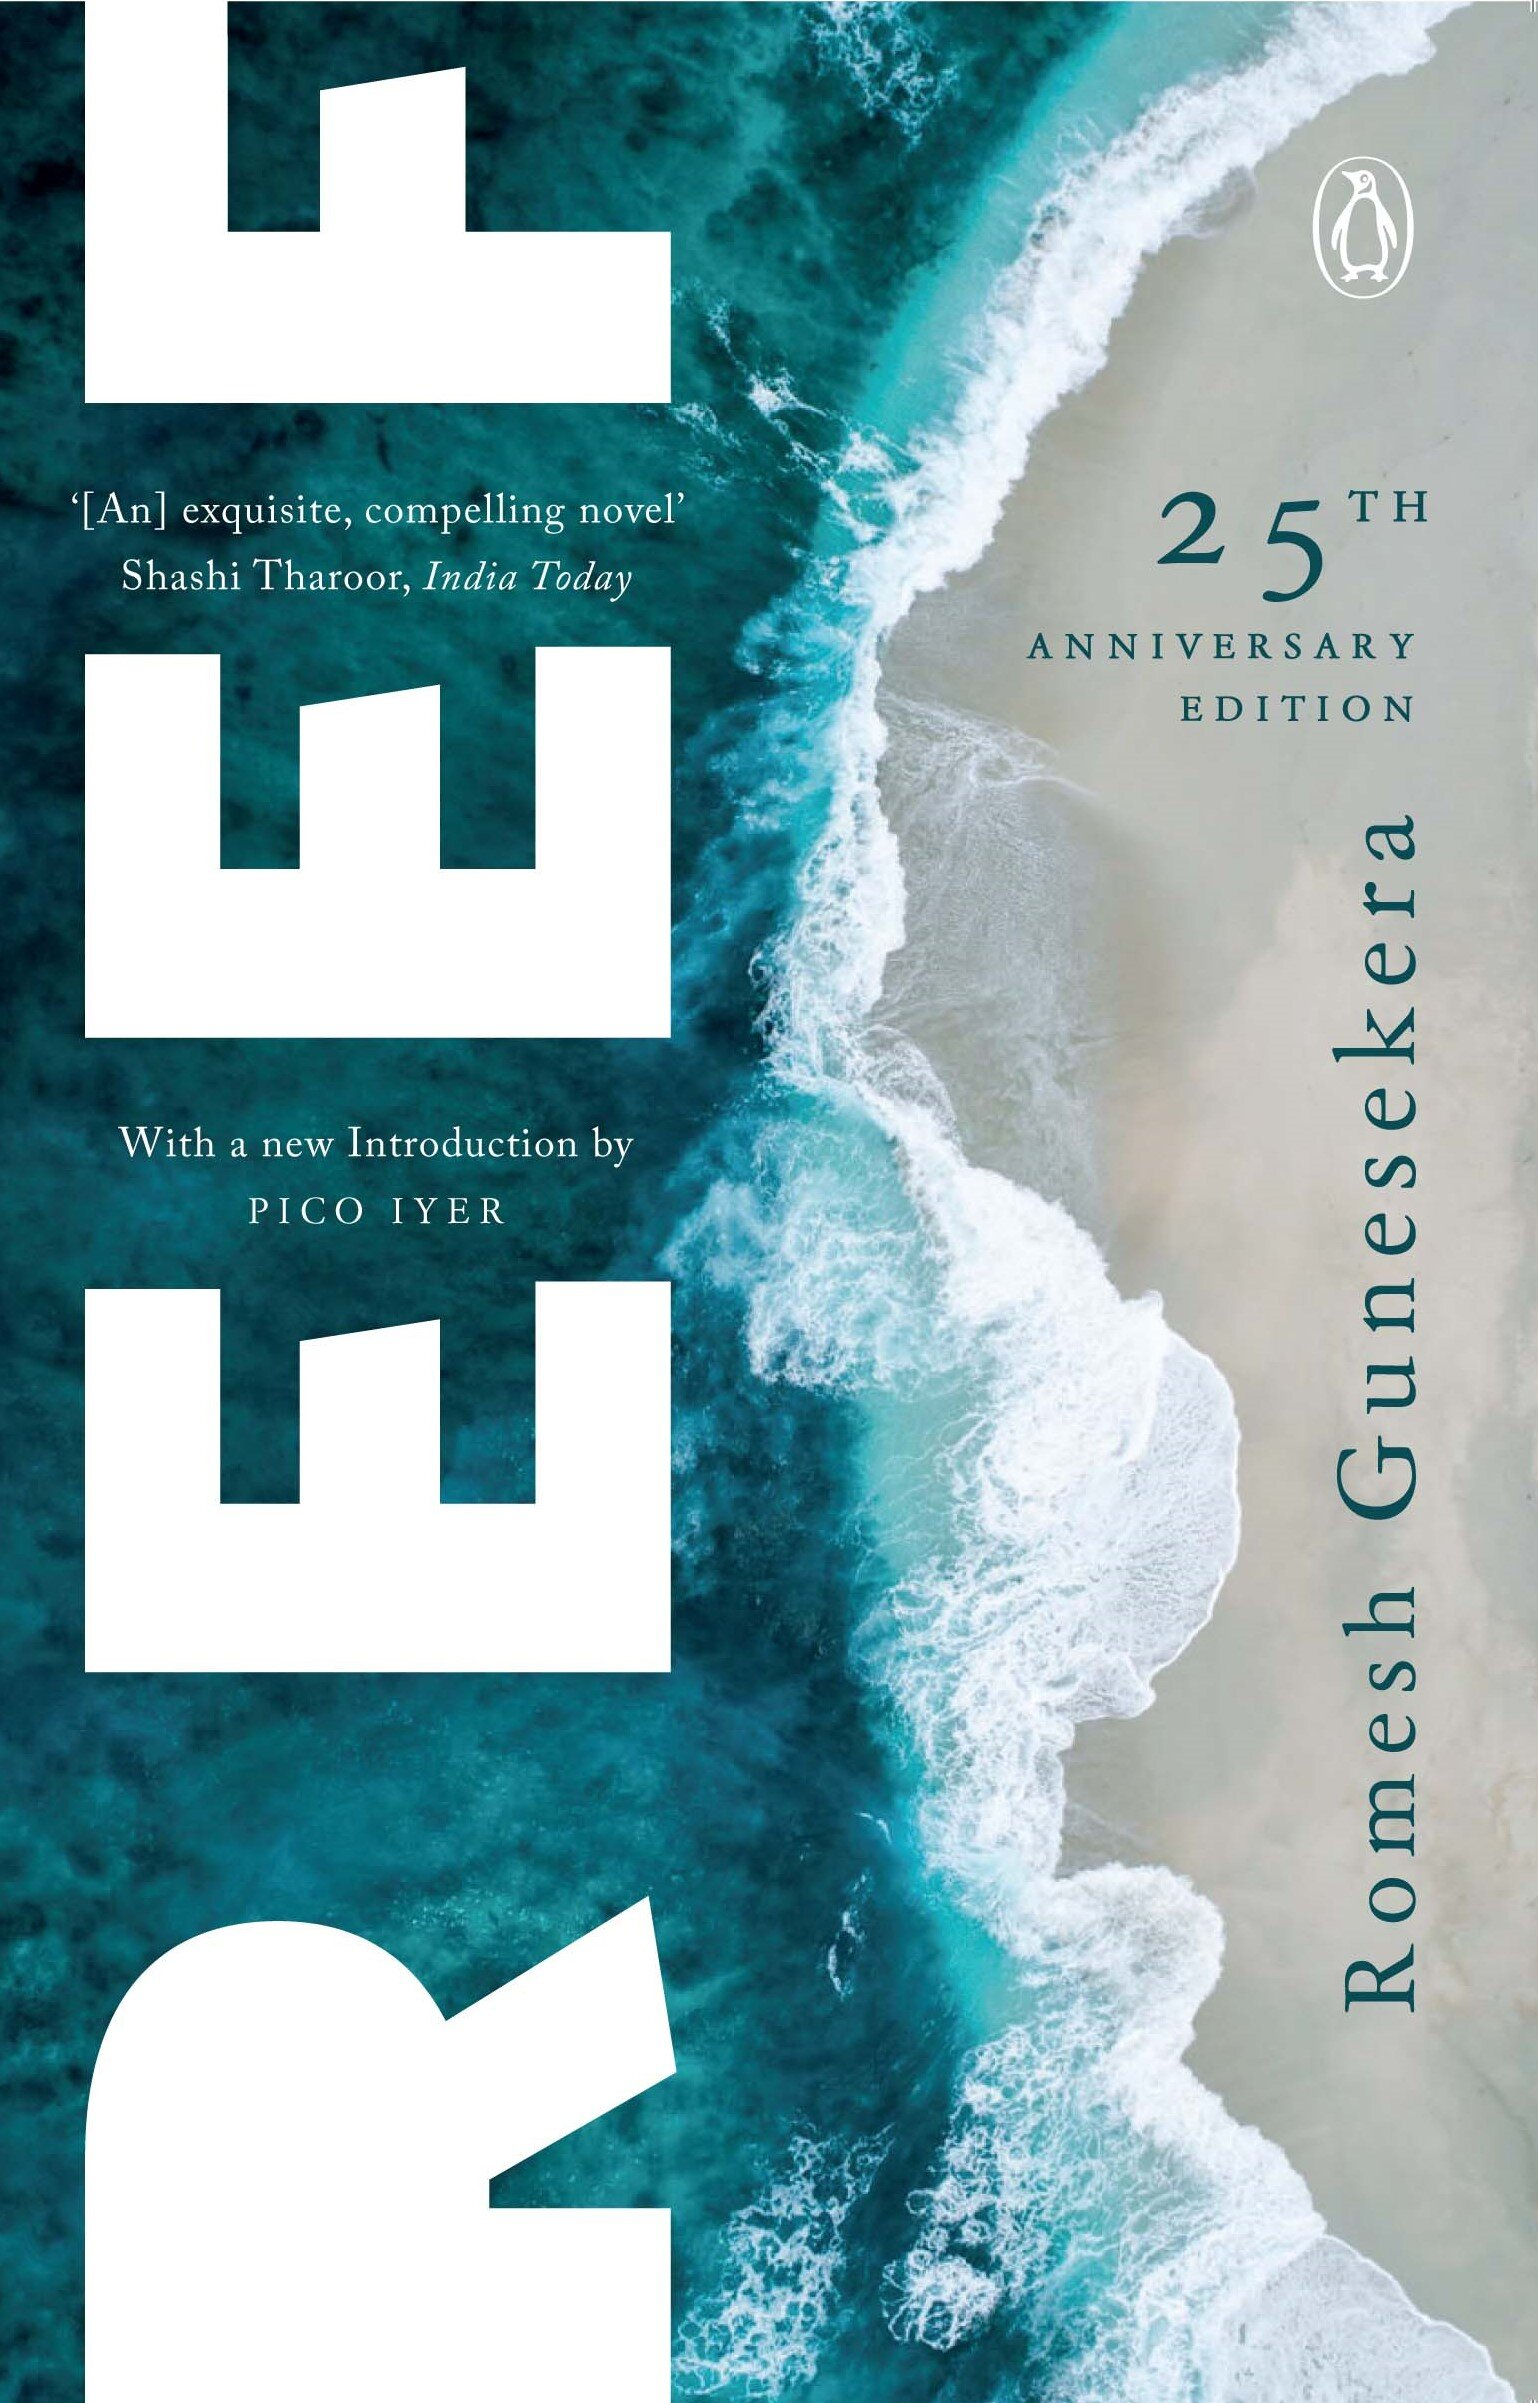 Reef 25th cover.jpg